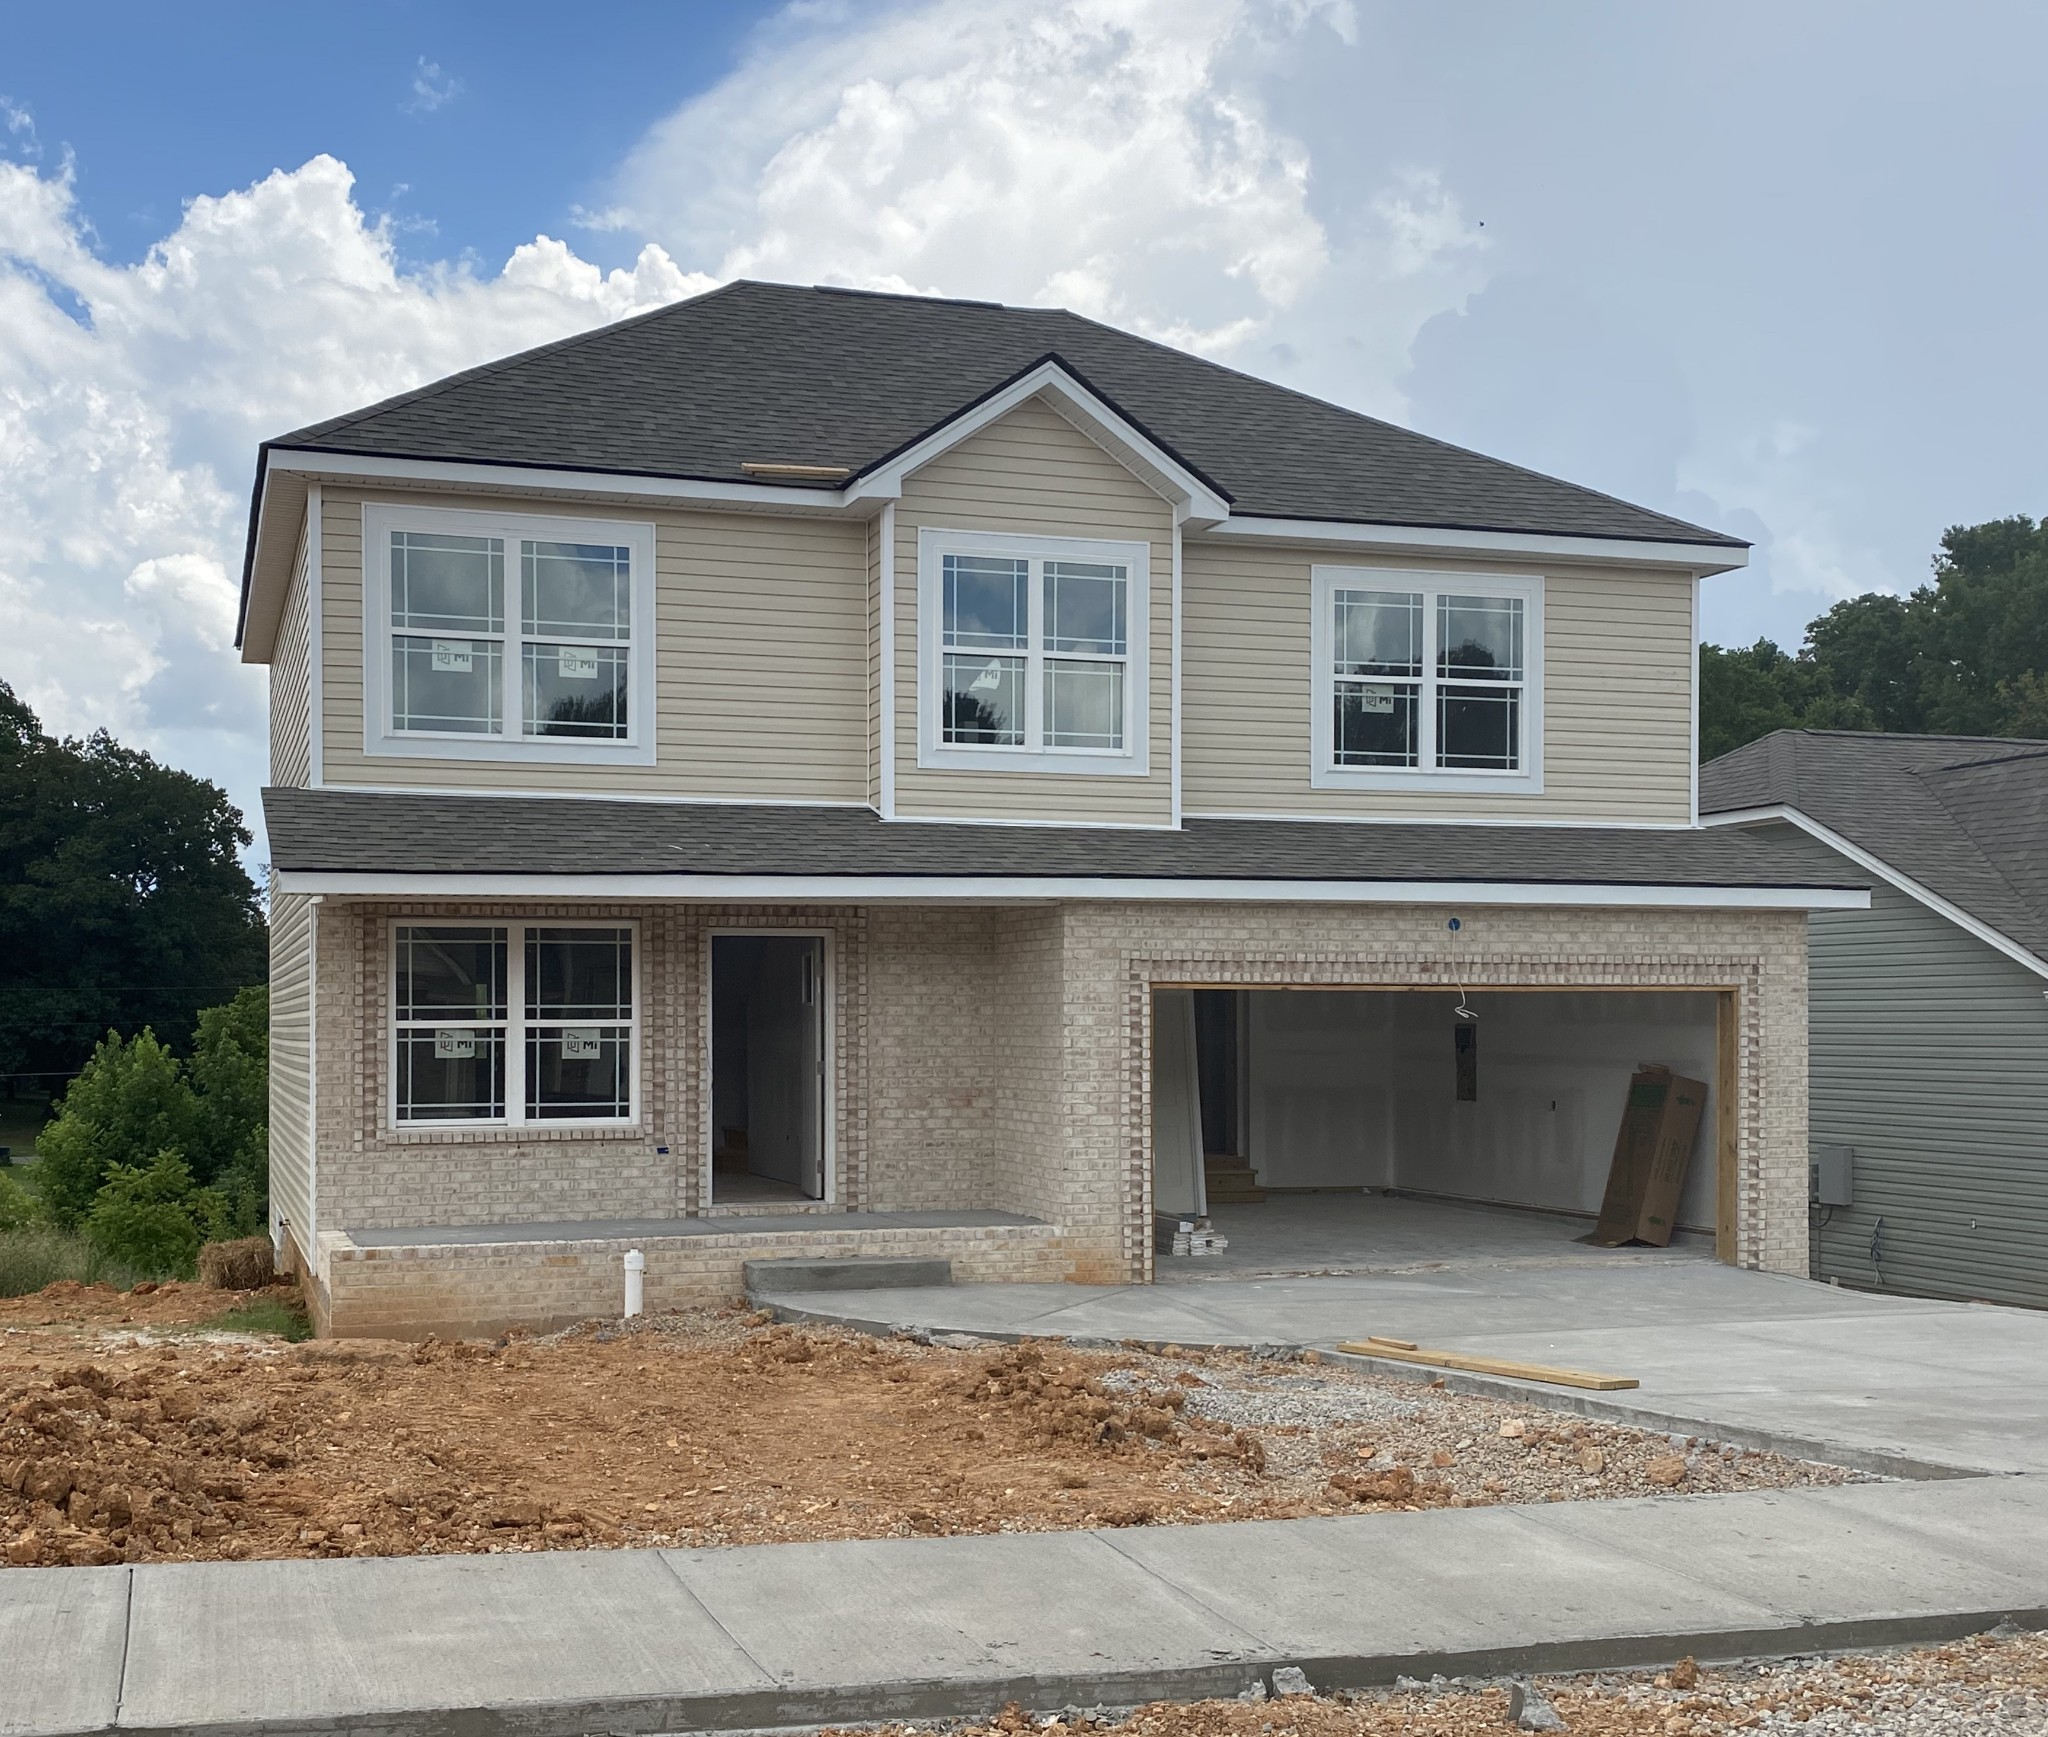 1116 Berra Dr Property Photo - Springfield, TN real estate listing